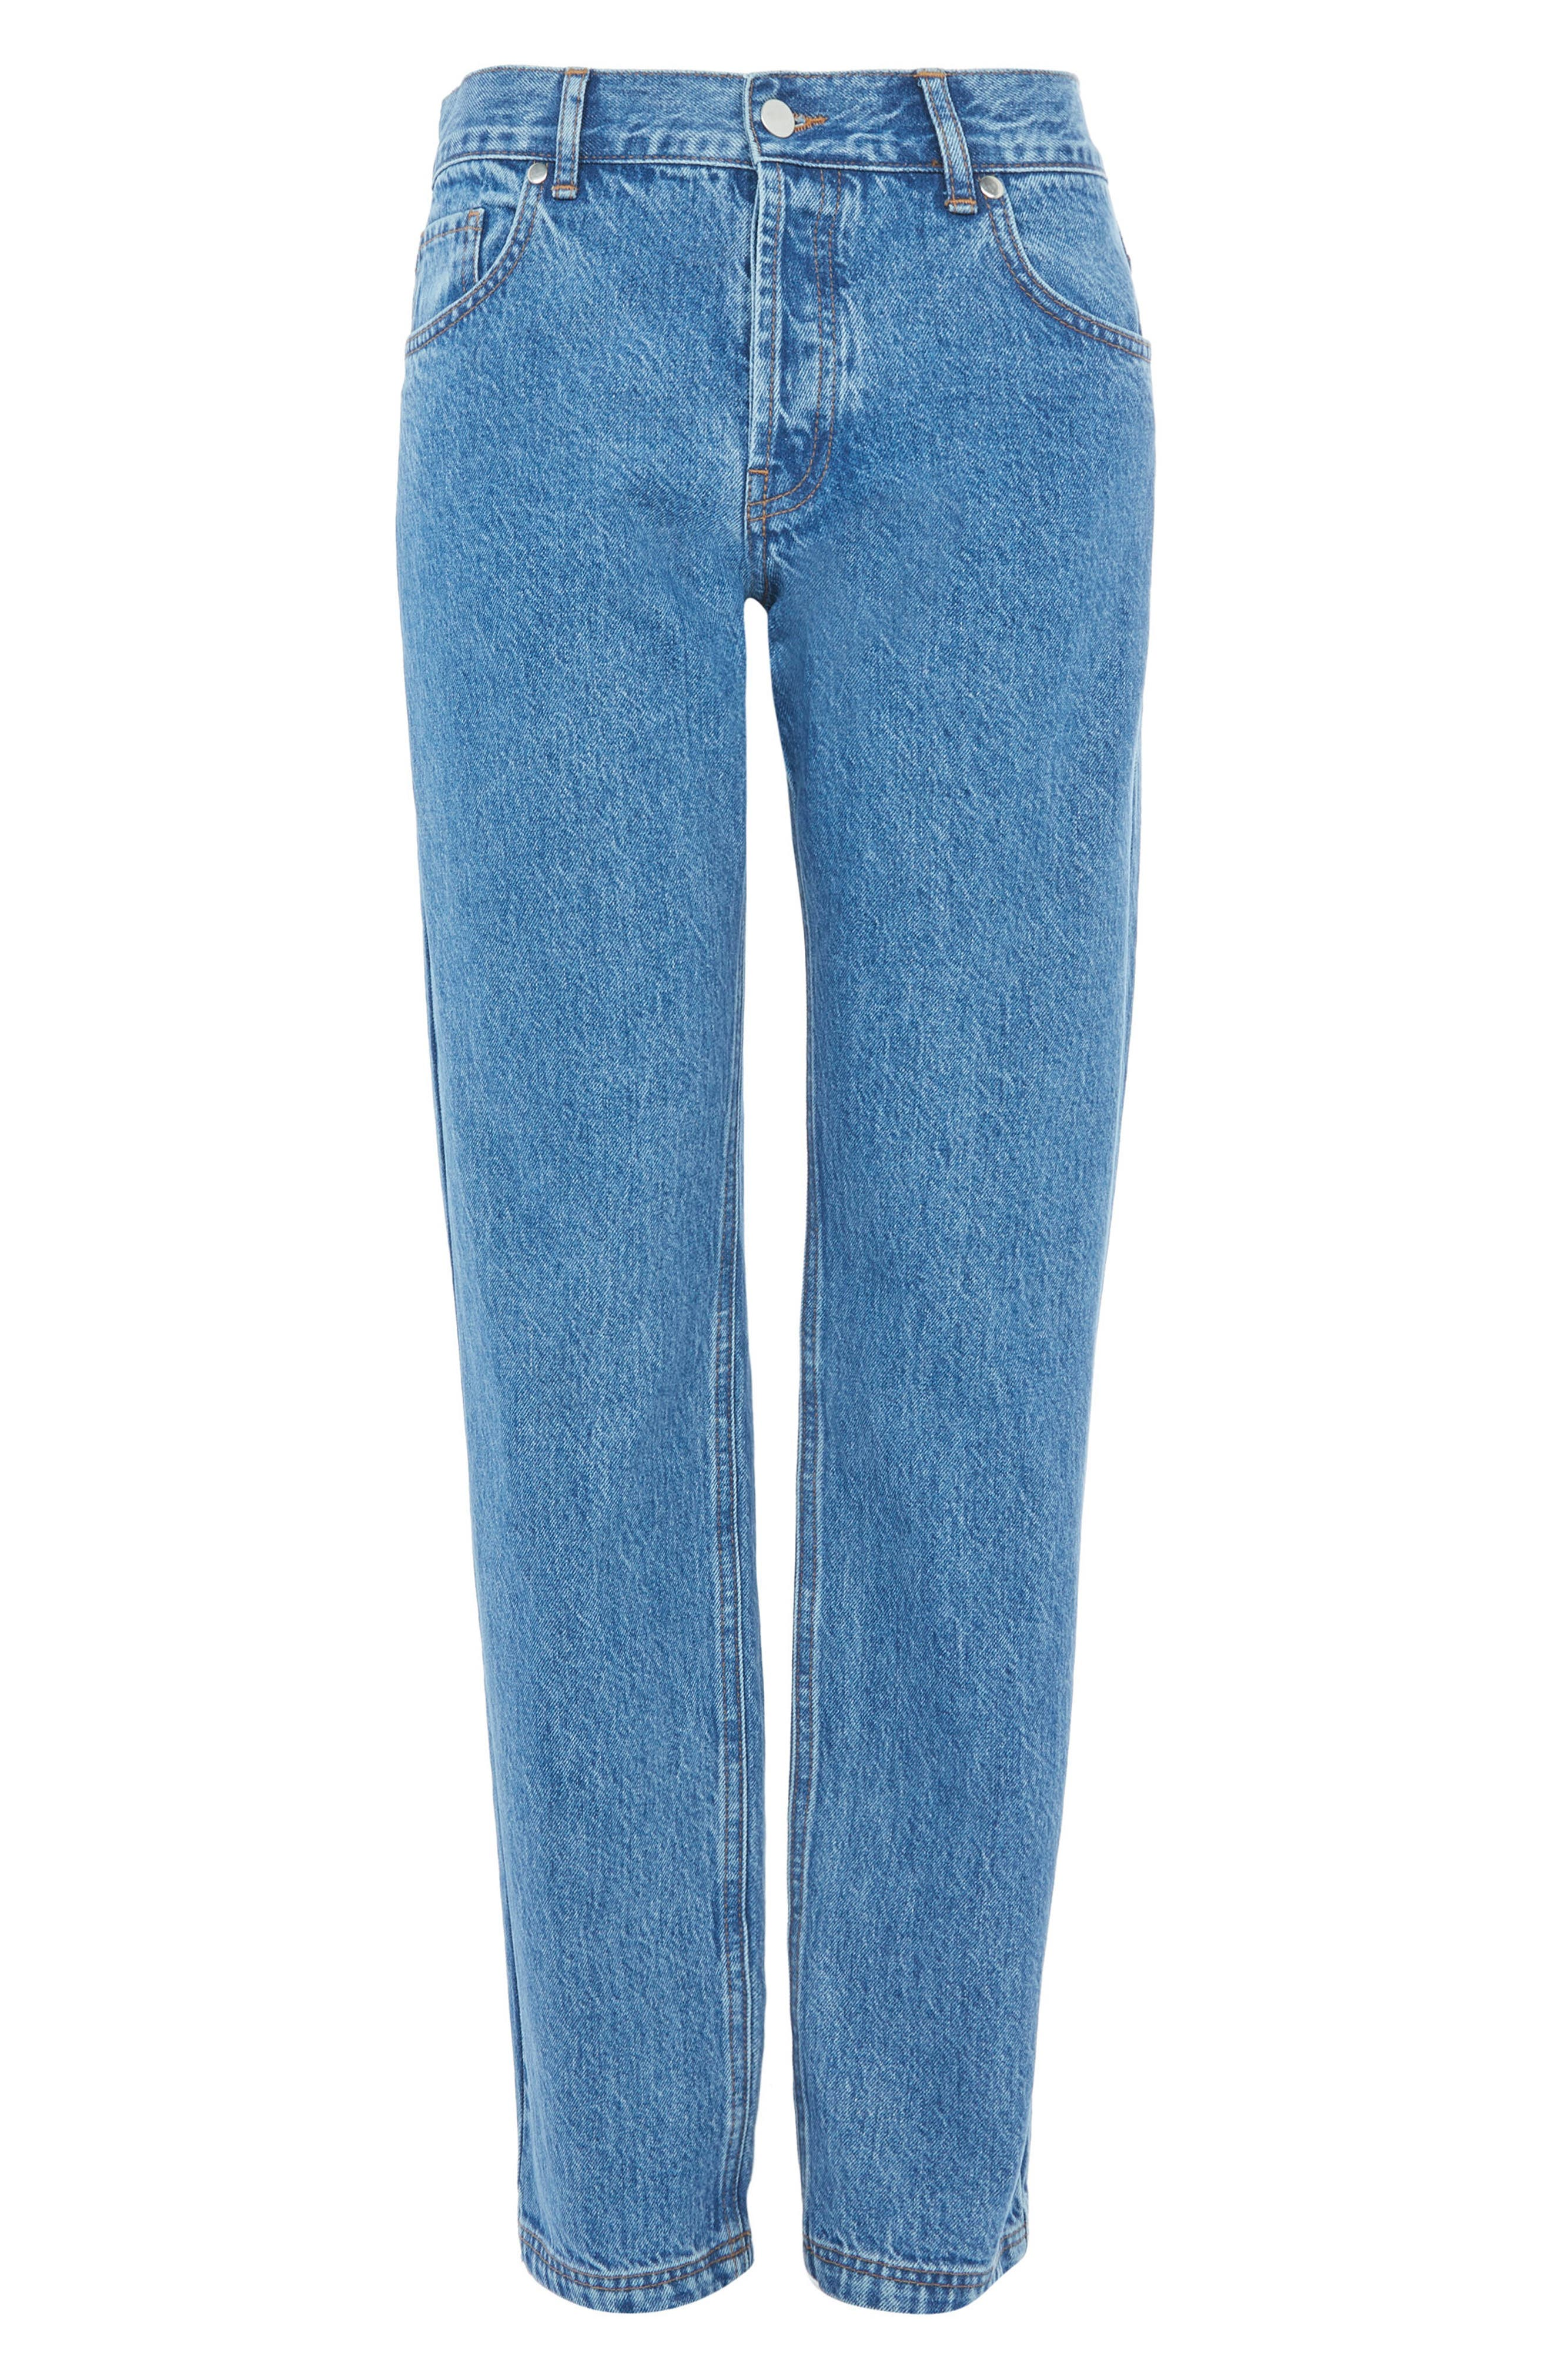 Topshop Medium Wash Straight Leg Jeans